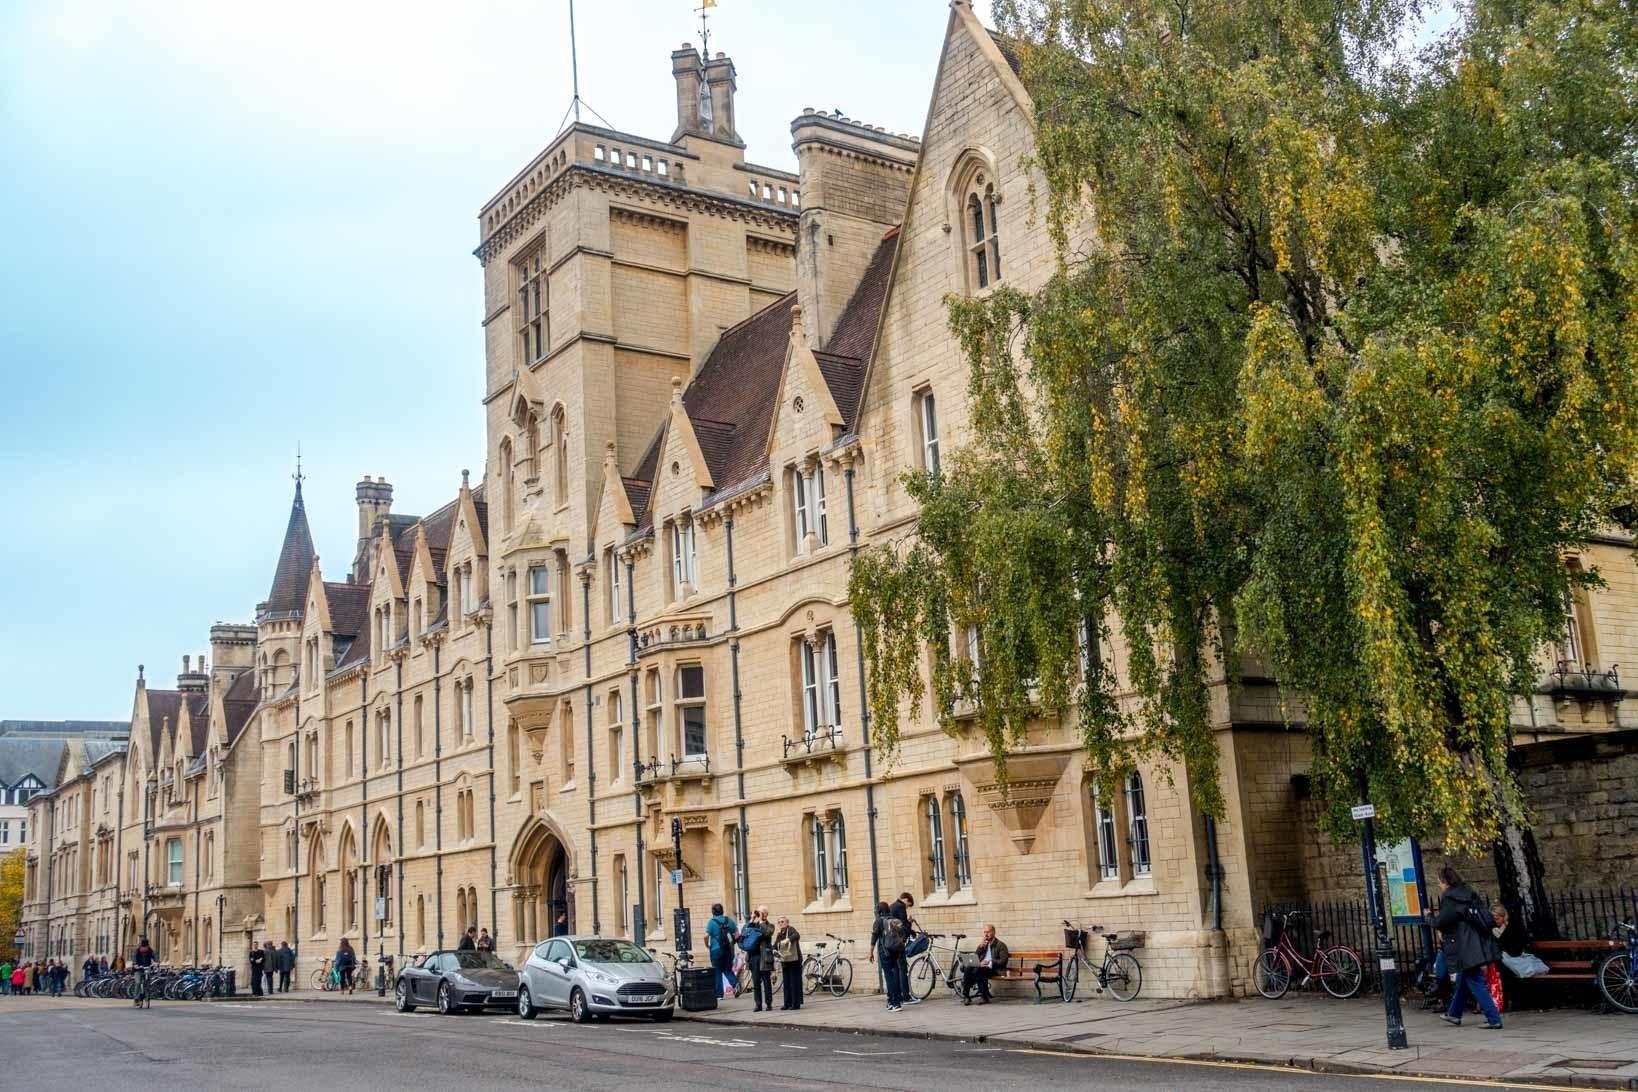 Balliol College in the Oxford town centre